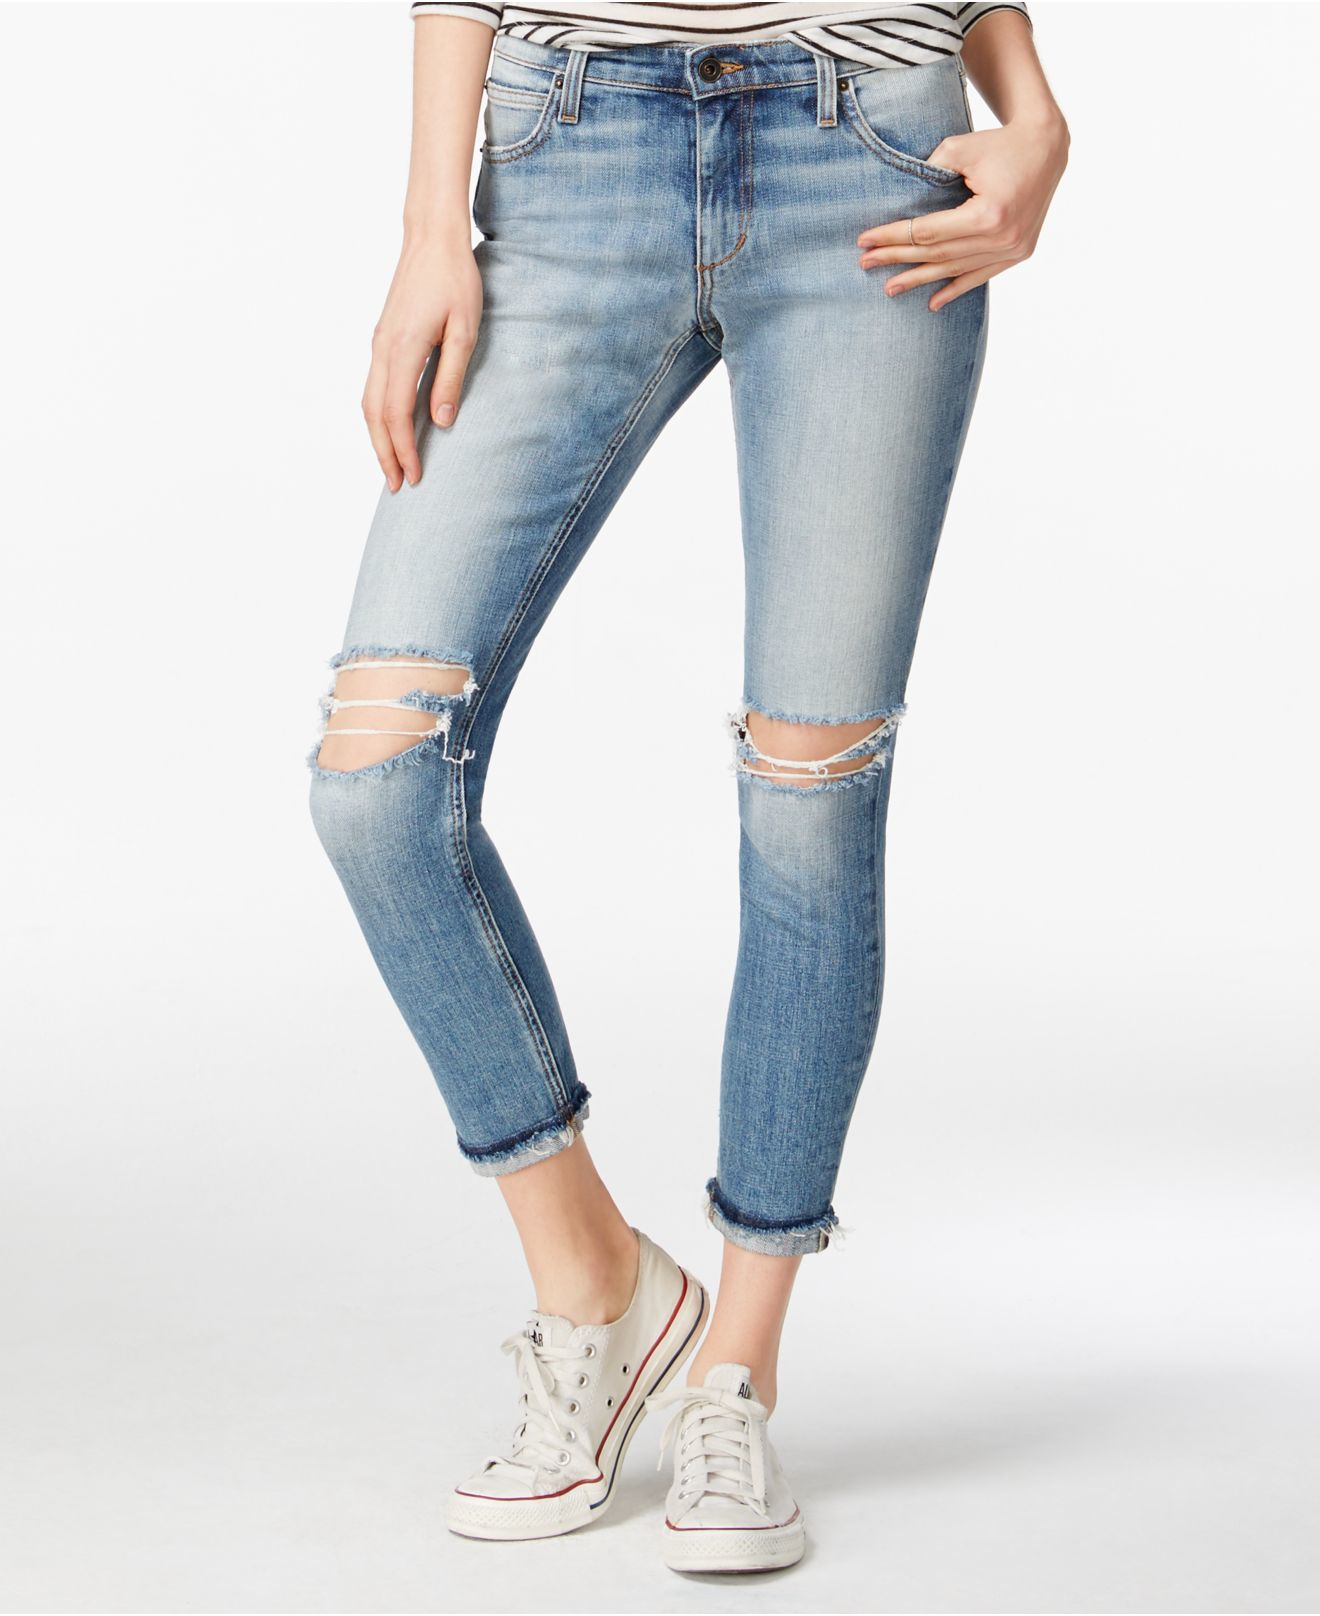 Joe&39s jeans Joe&39s The Billie Ripped Ankle Blakeley Wash Jeans in